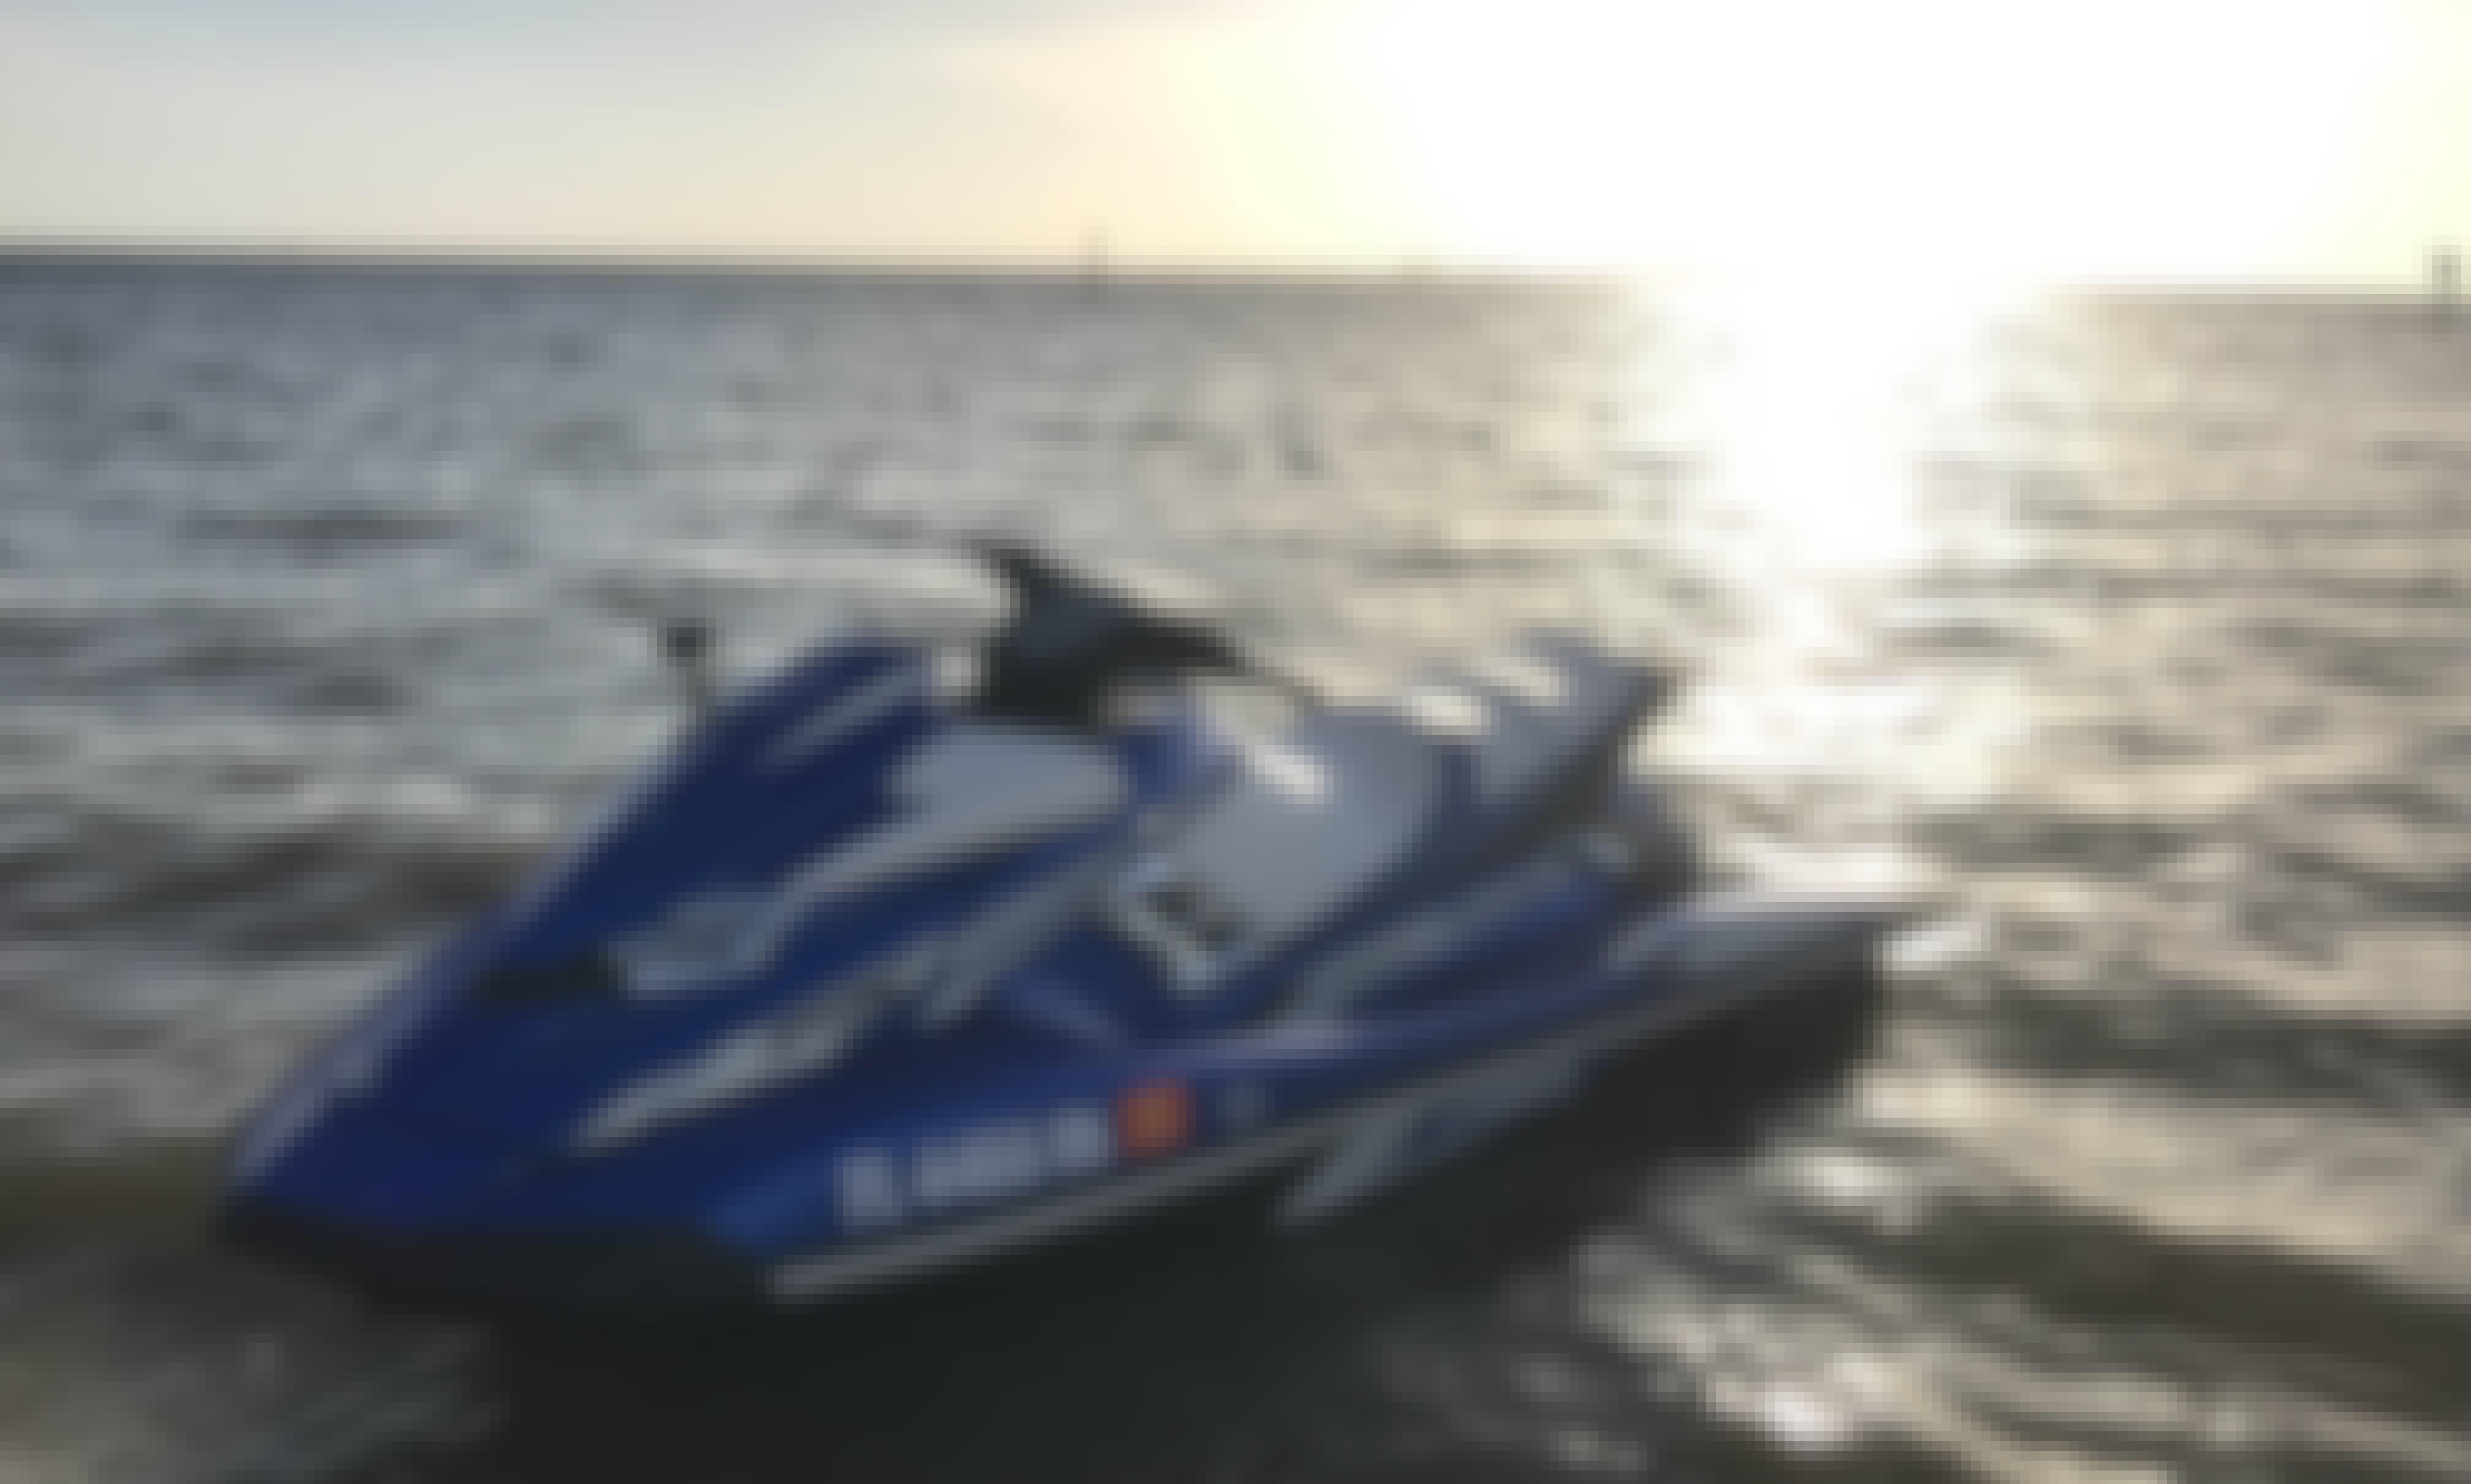 Jet Ski for rent in Tampa, 2017 Yamaha FX SVHO, 70+ mph